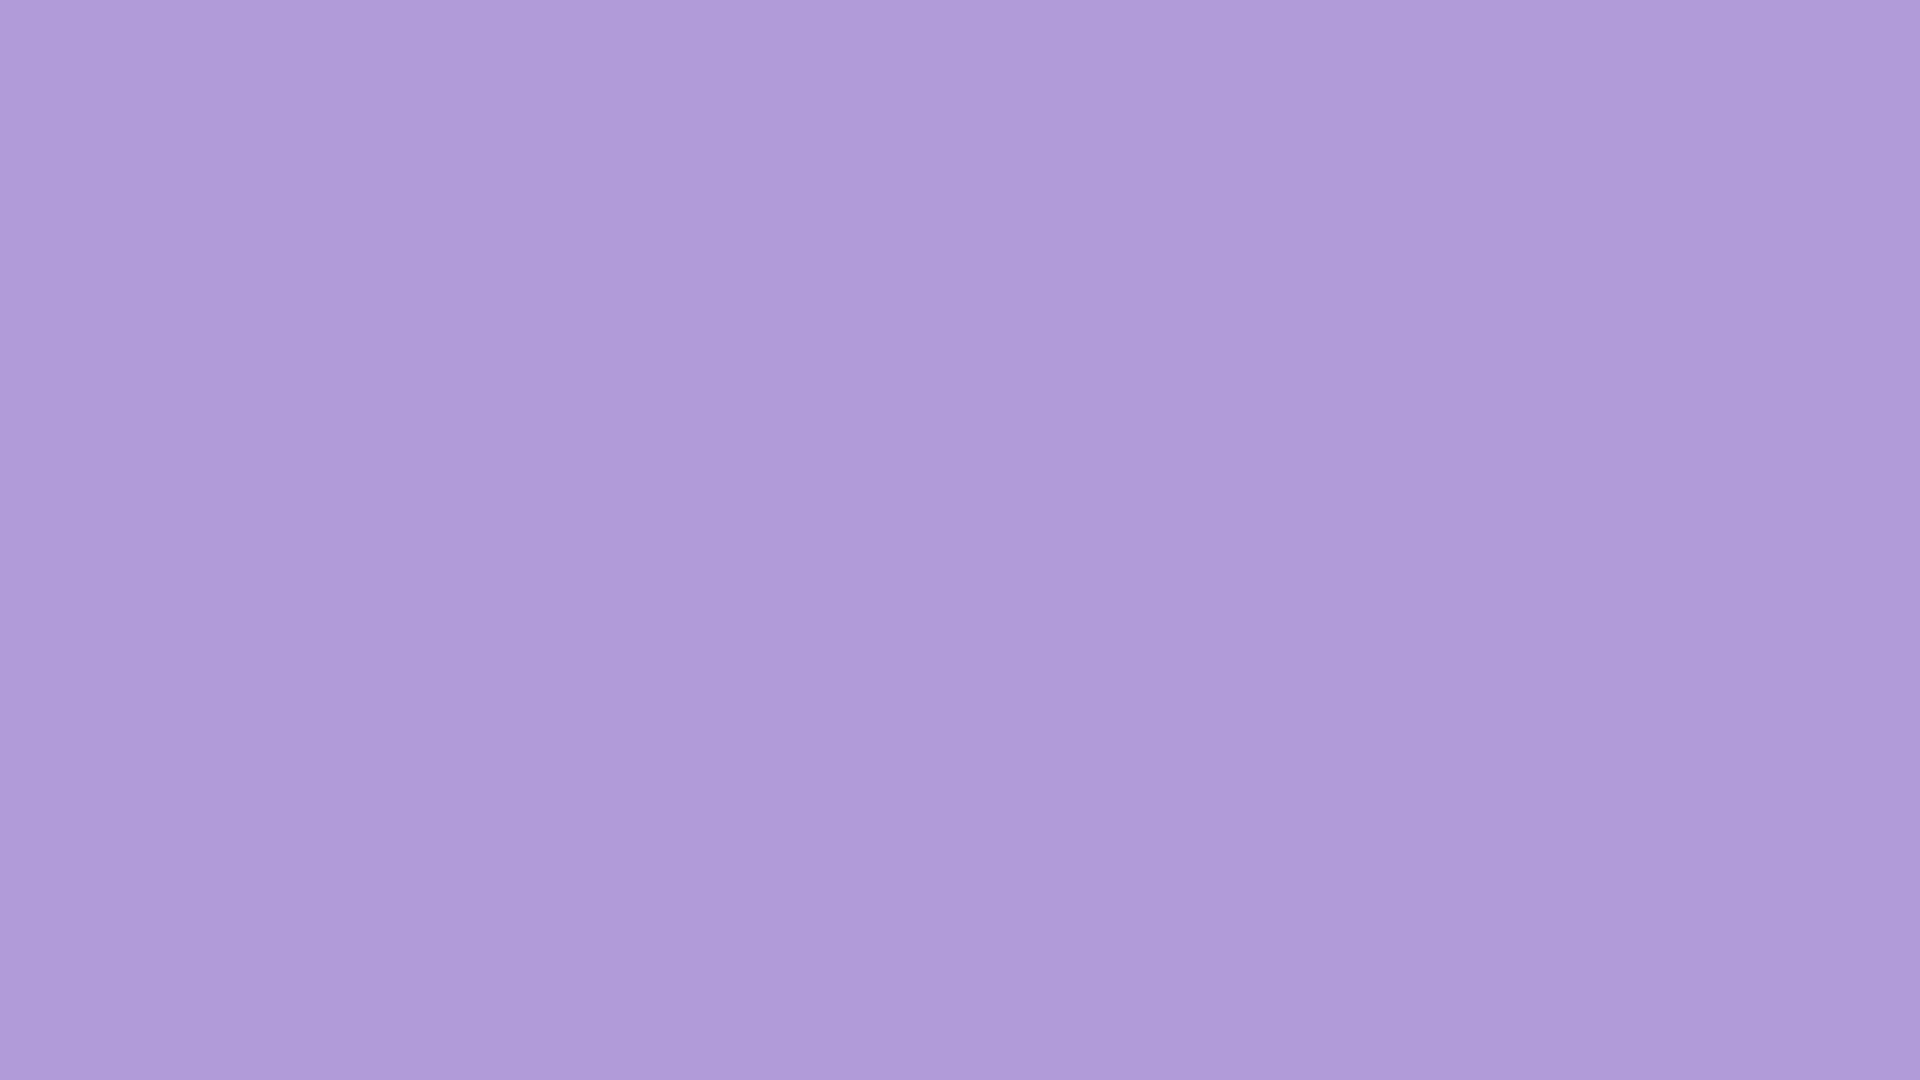 Light Purple Background Iphone Lavender Aesthetic Wallpaper